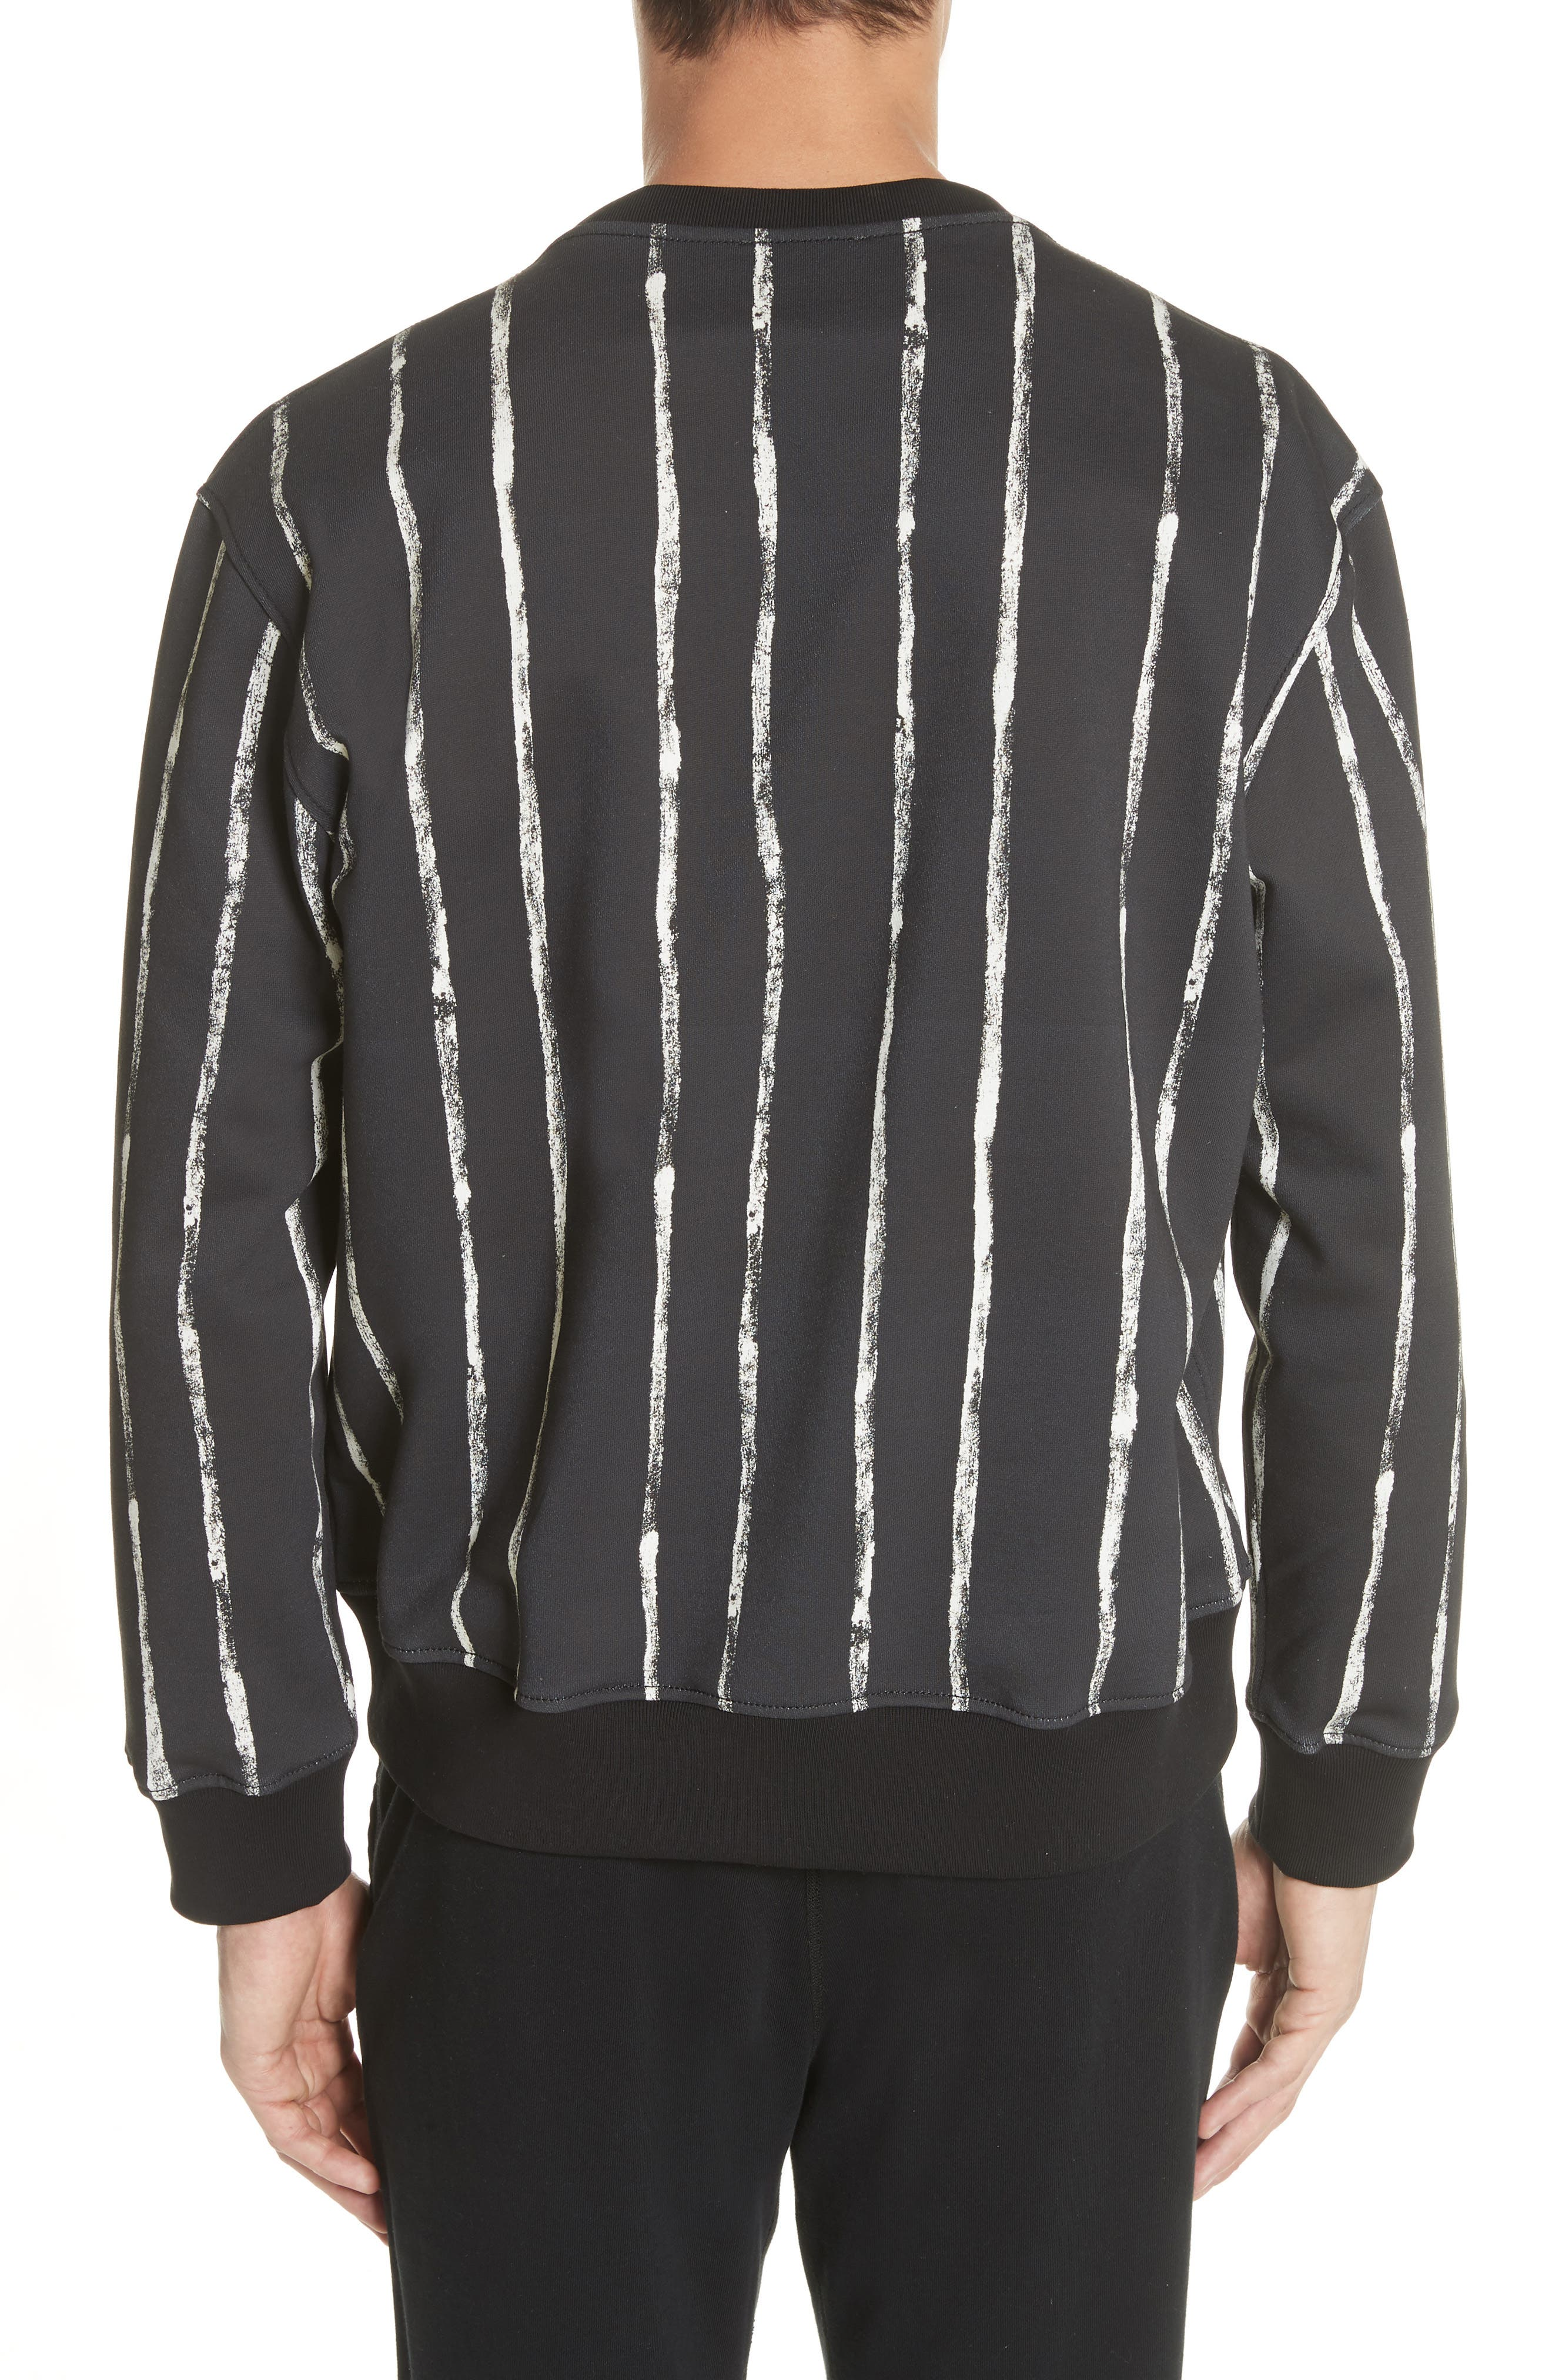 Paint Stripe Crewneck Sweatshirt,                             Alternate thumbnail 2, color,                             Black/ White